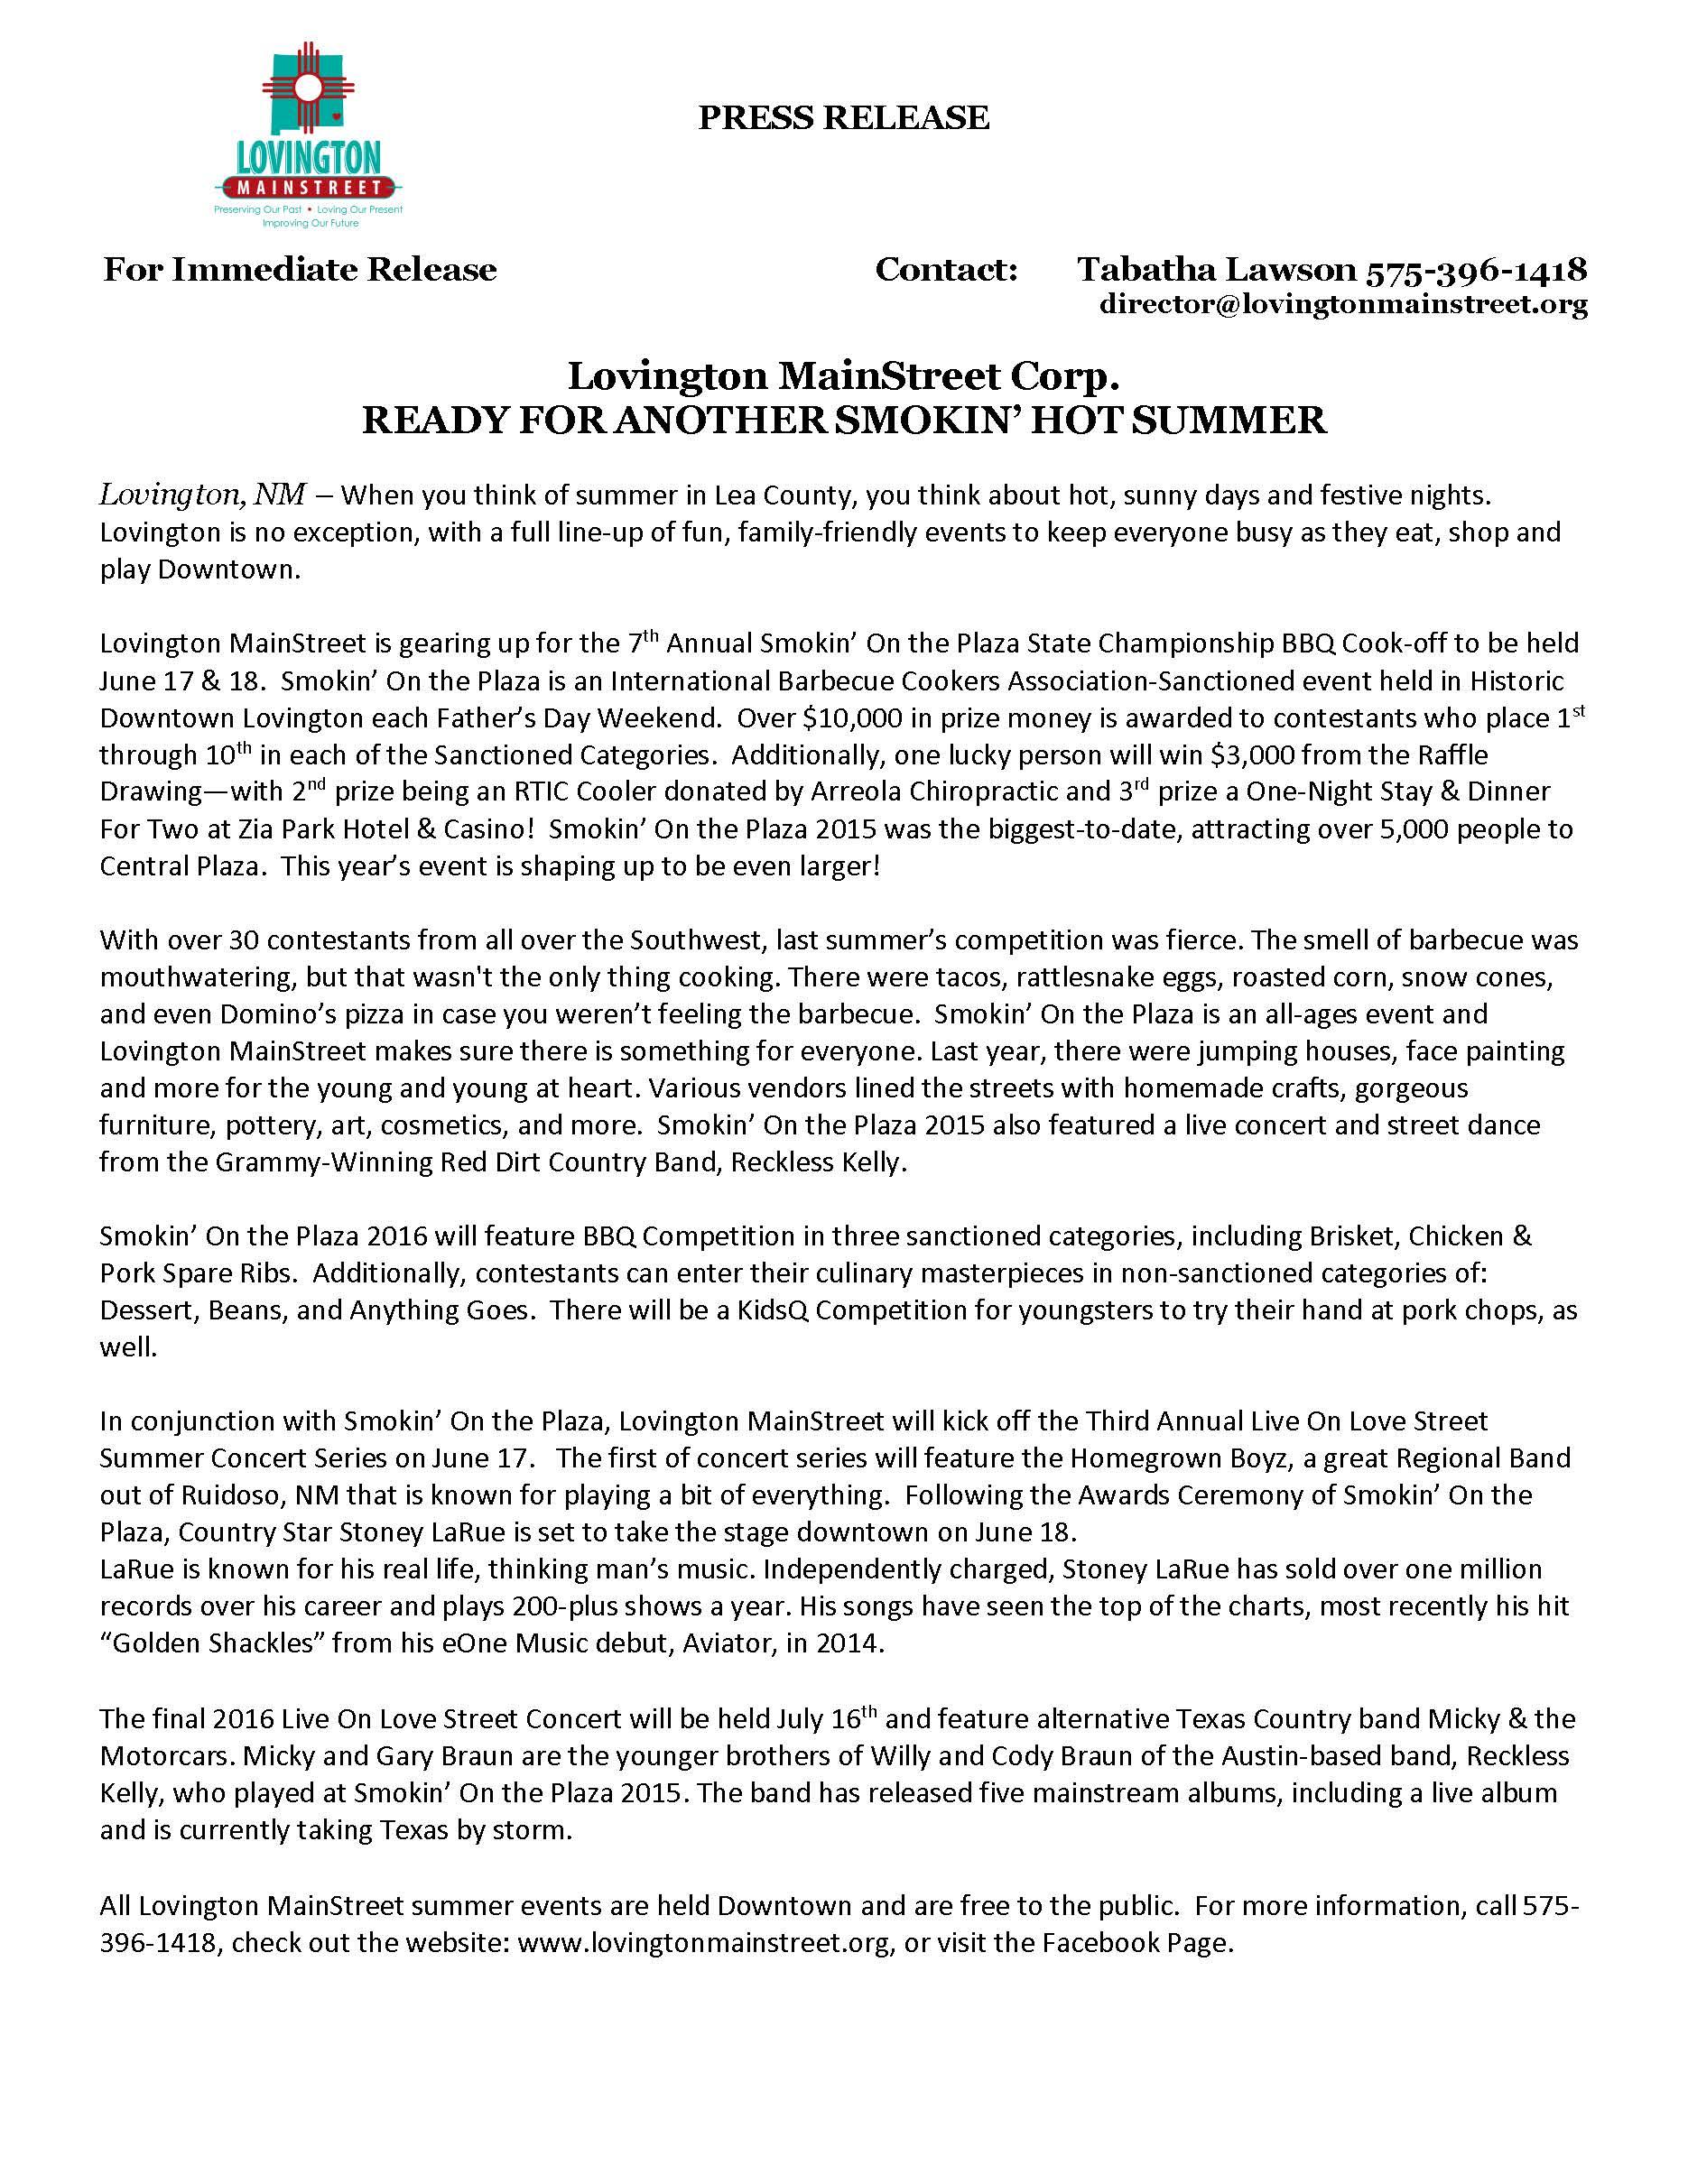 Press Release SOTP_Page_1